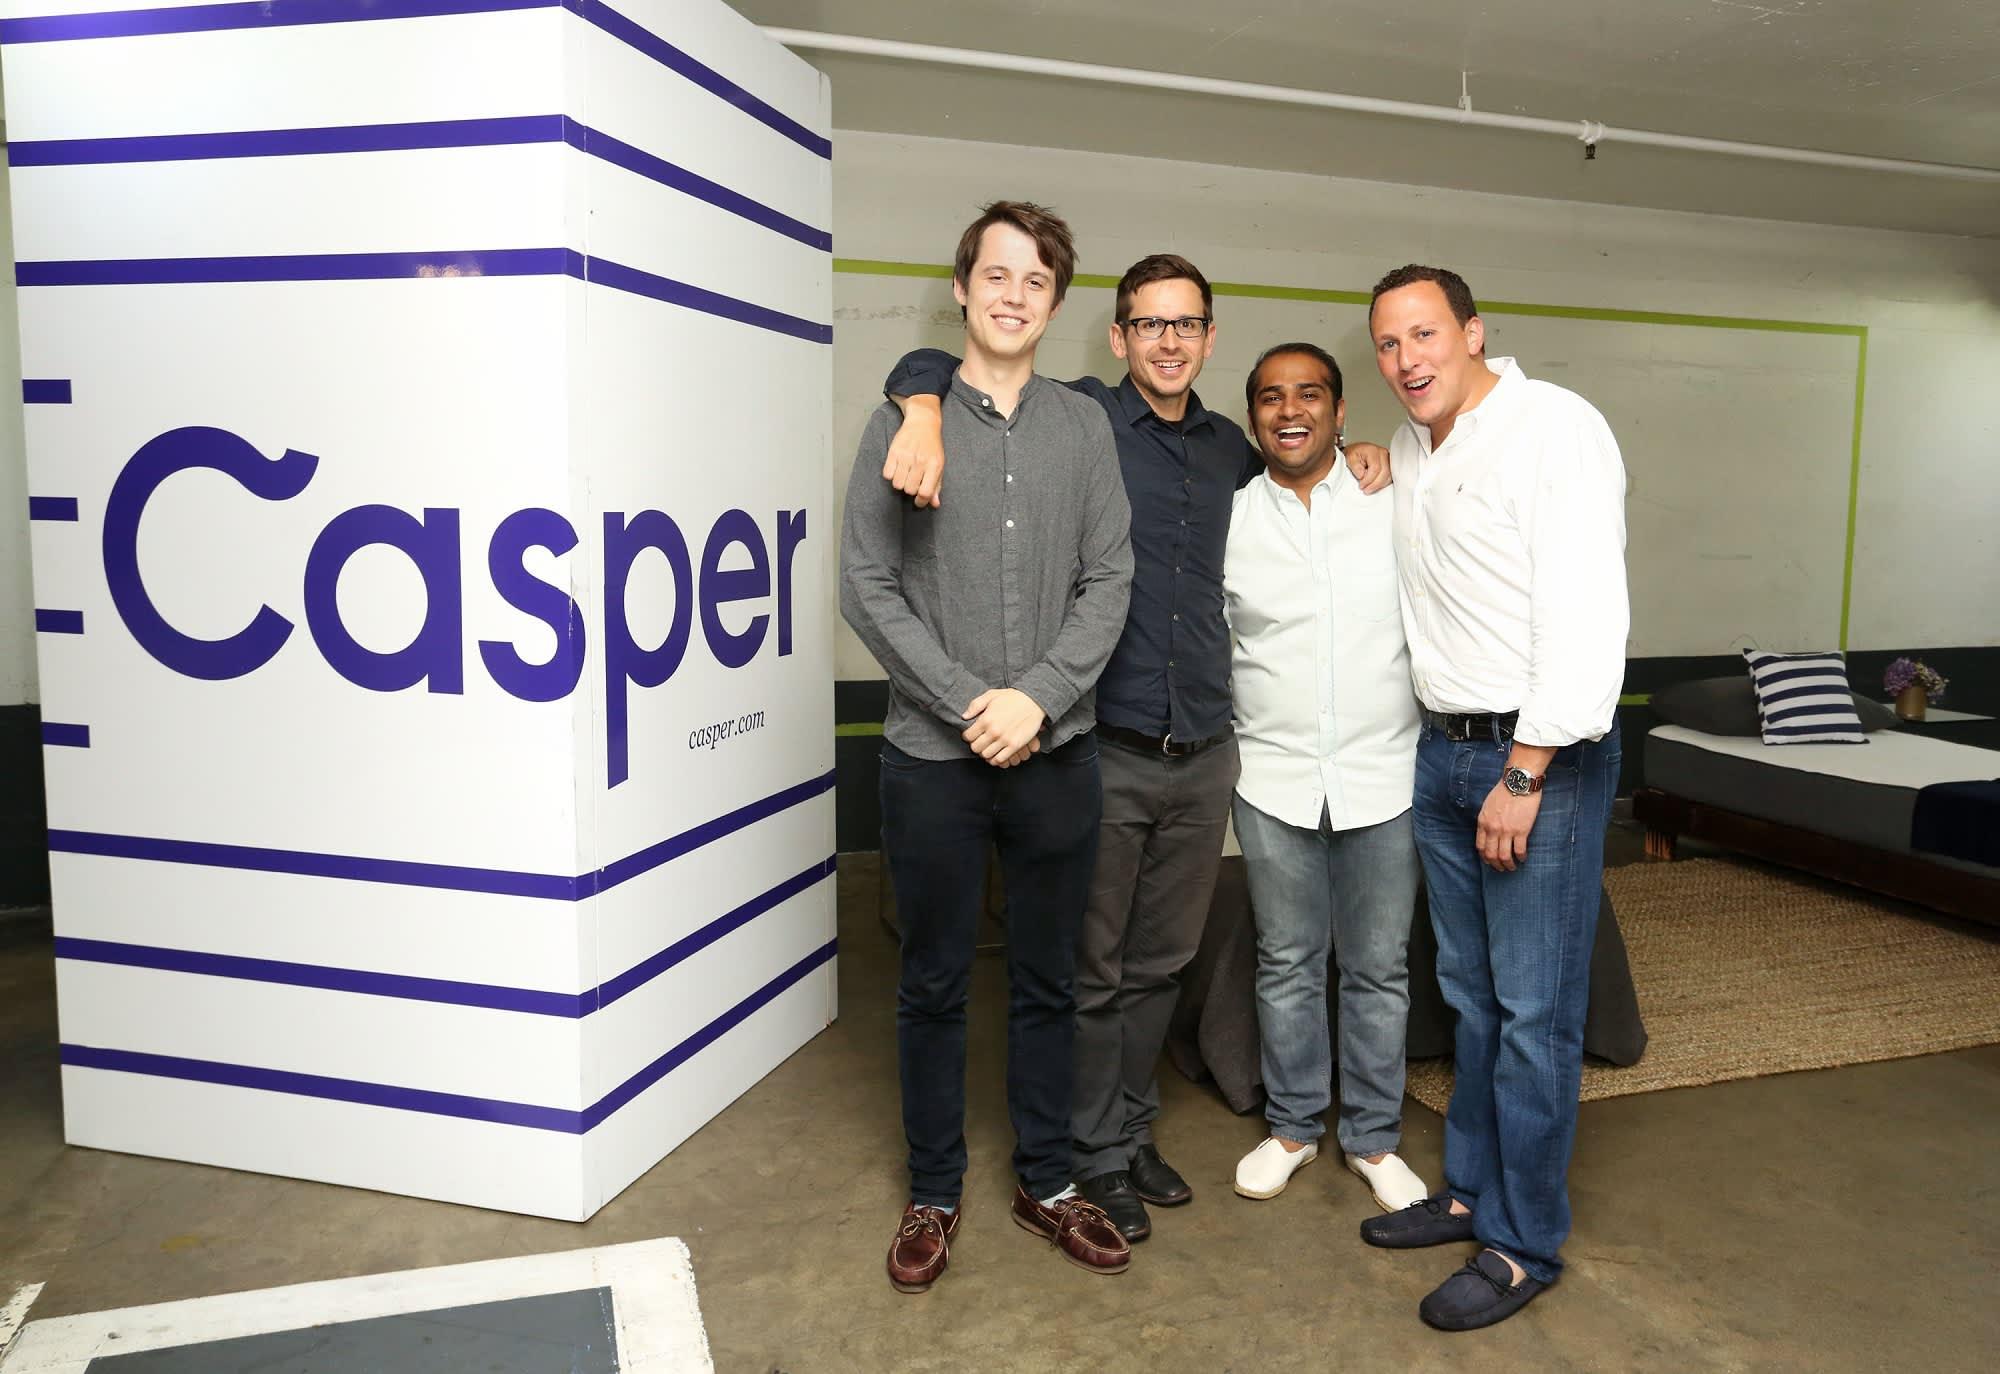 How a Casper executive's sleep issues led the billion-dollar bed start-up into the CBD gummies market